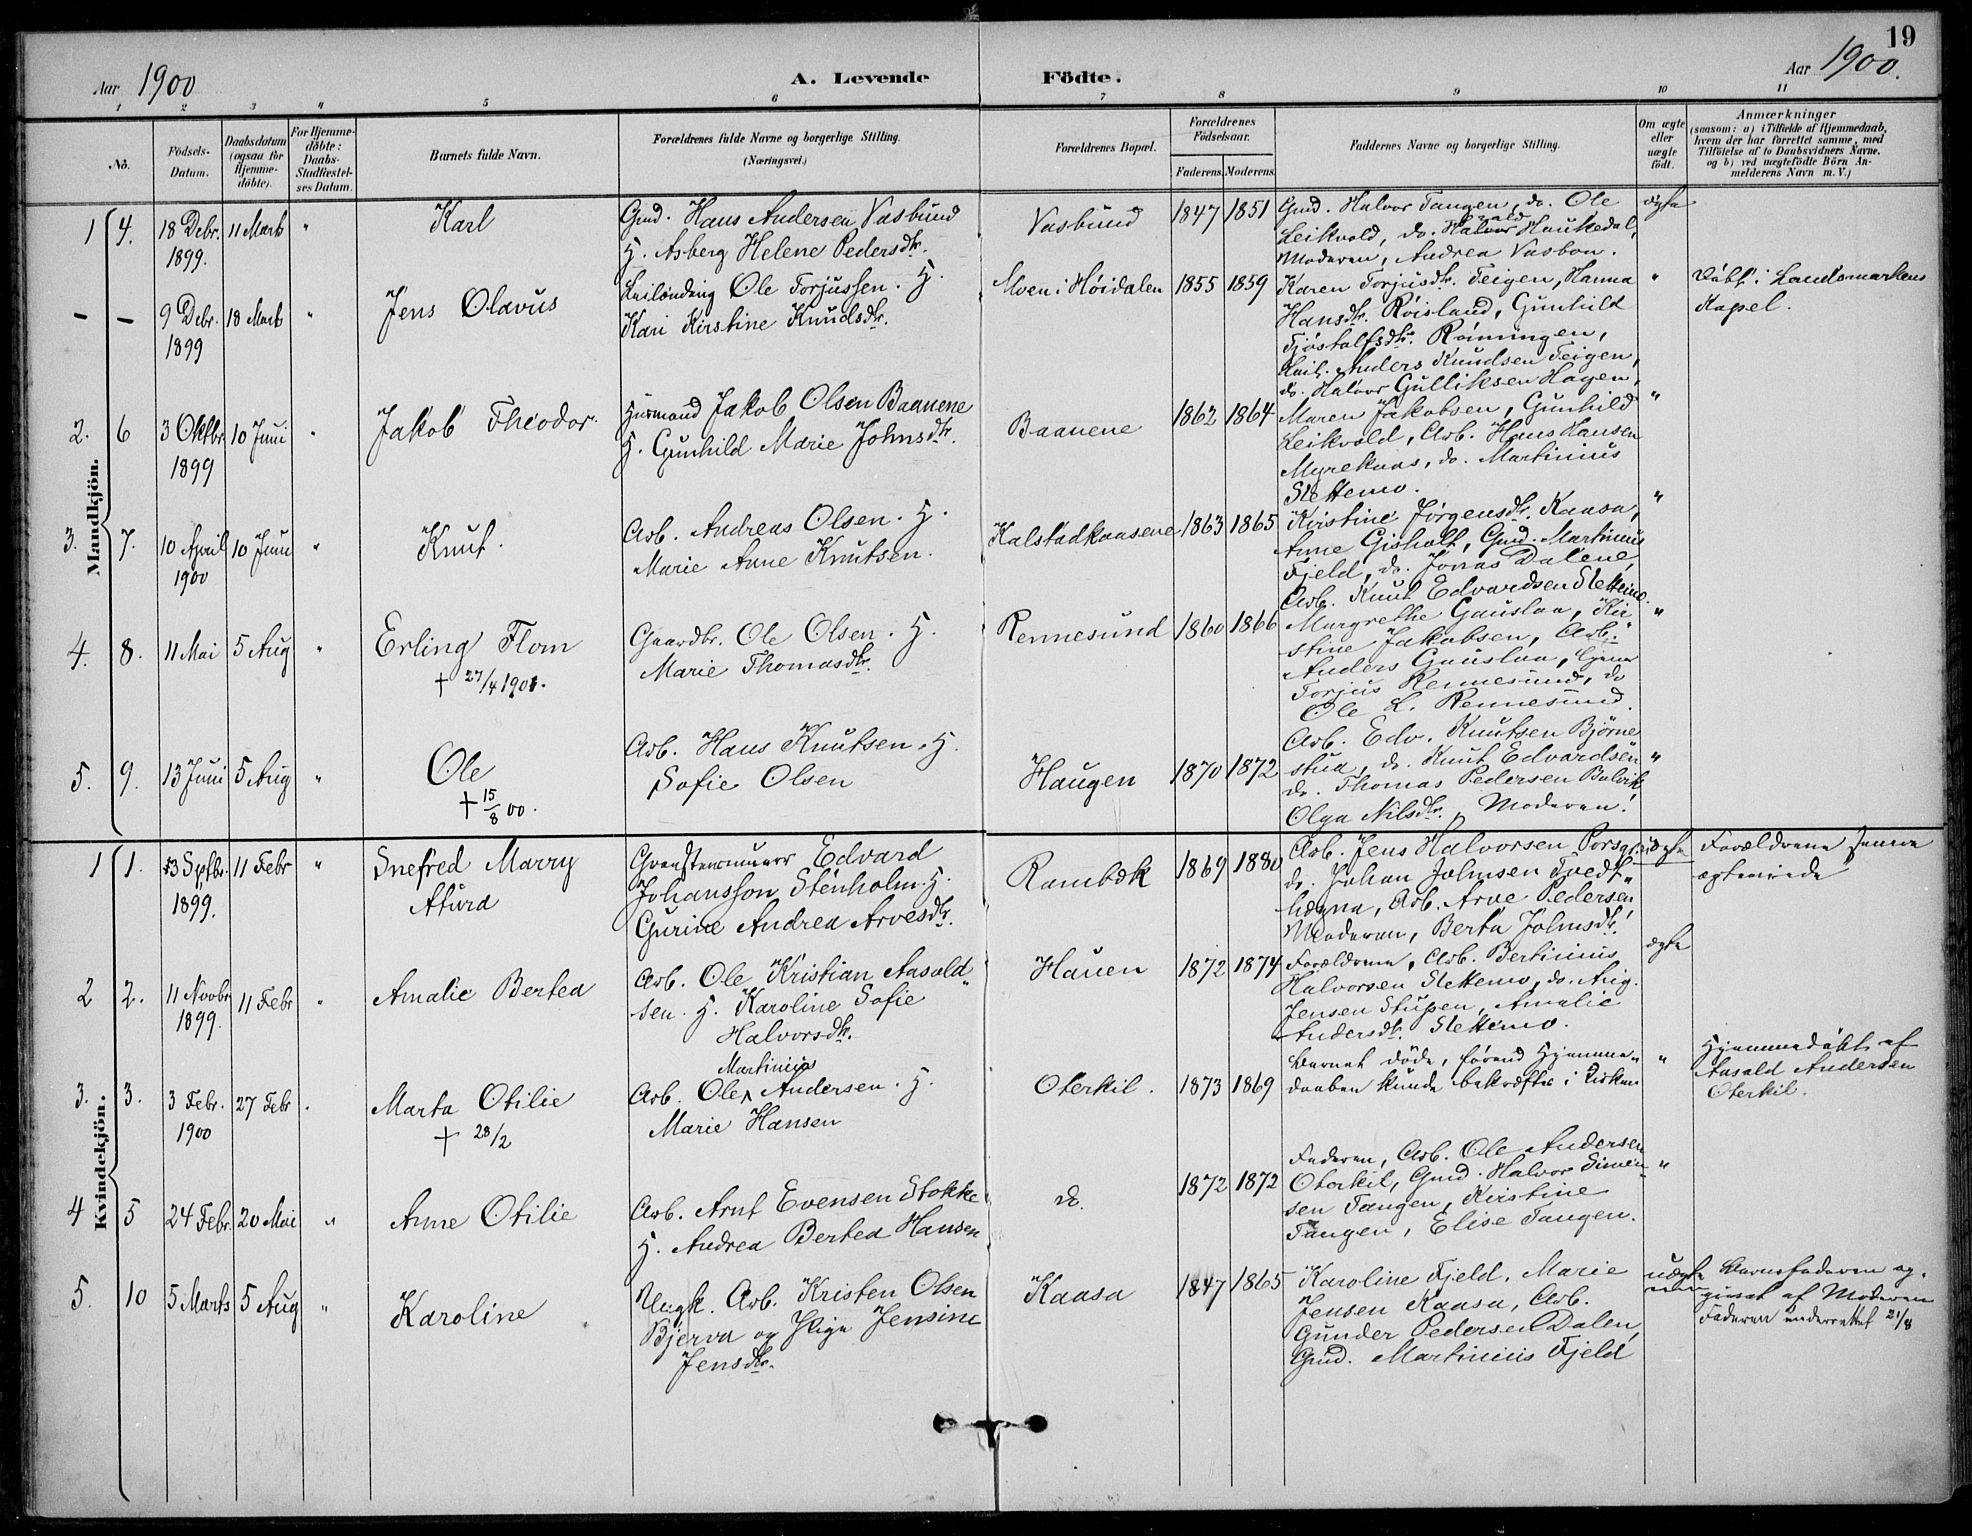 SAKO, Solum kirkebøker, F/Fc/L0002: Ministerialbok nr. III 2, 1892-1906, s. 19